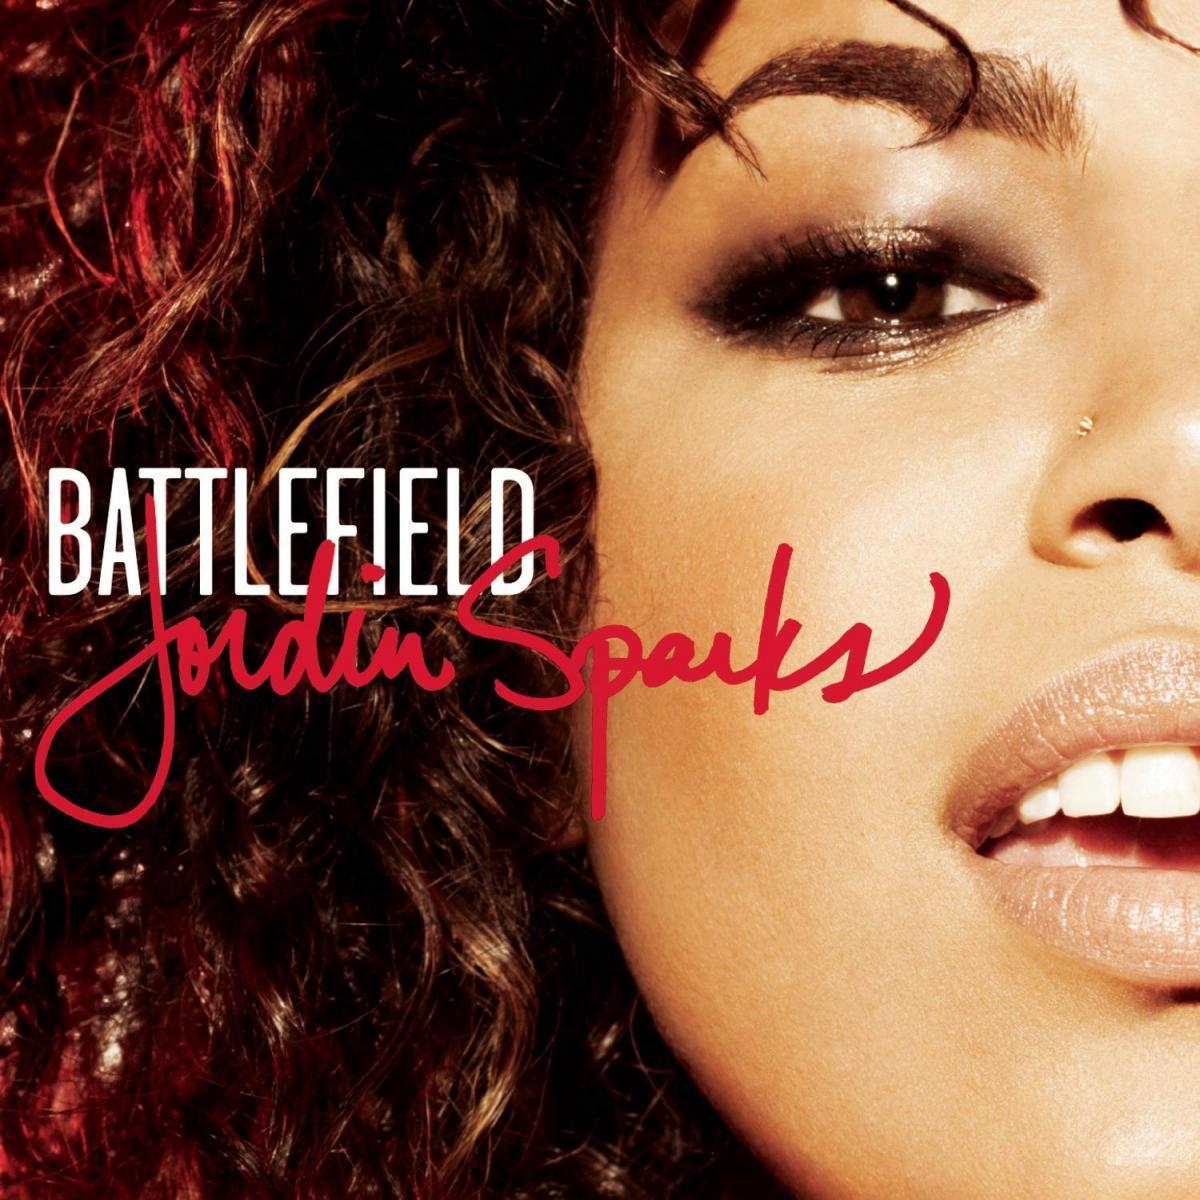 Jordin Sparks, Battlefield